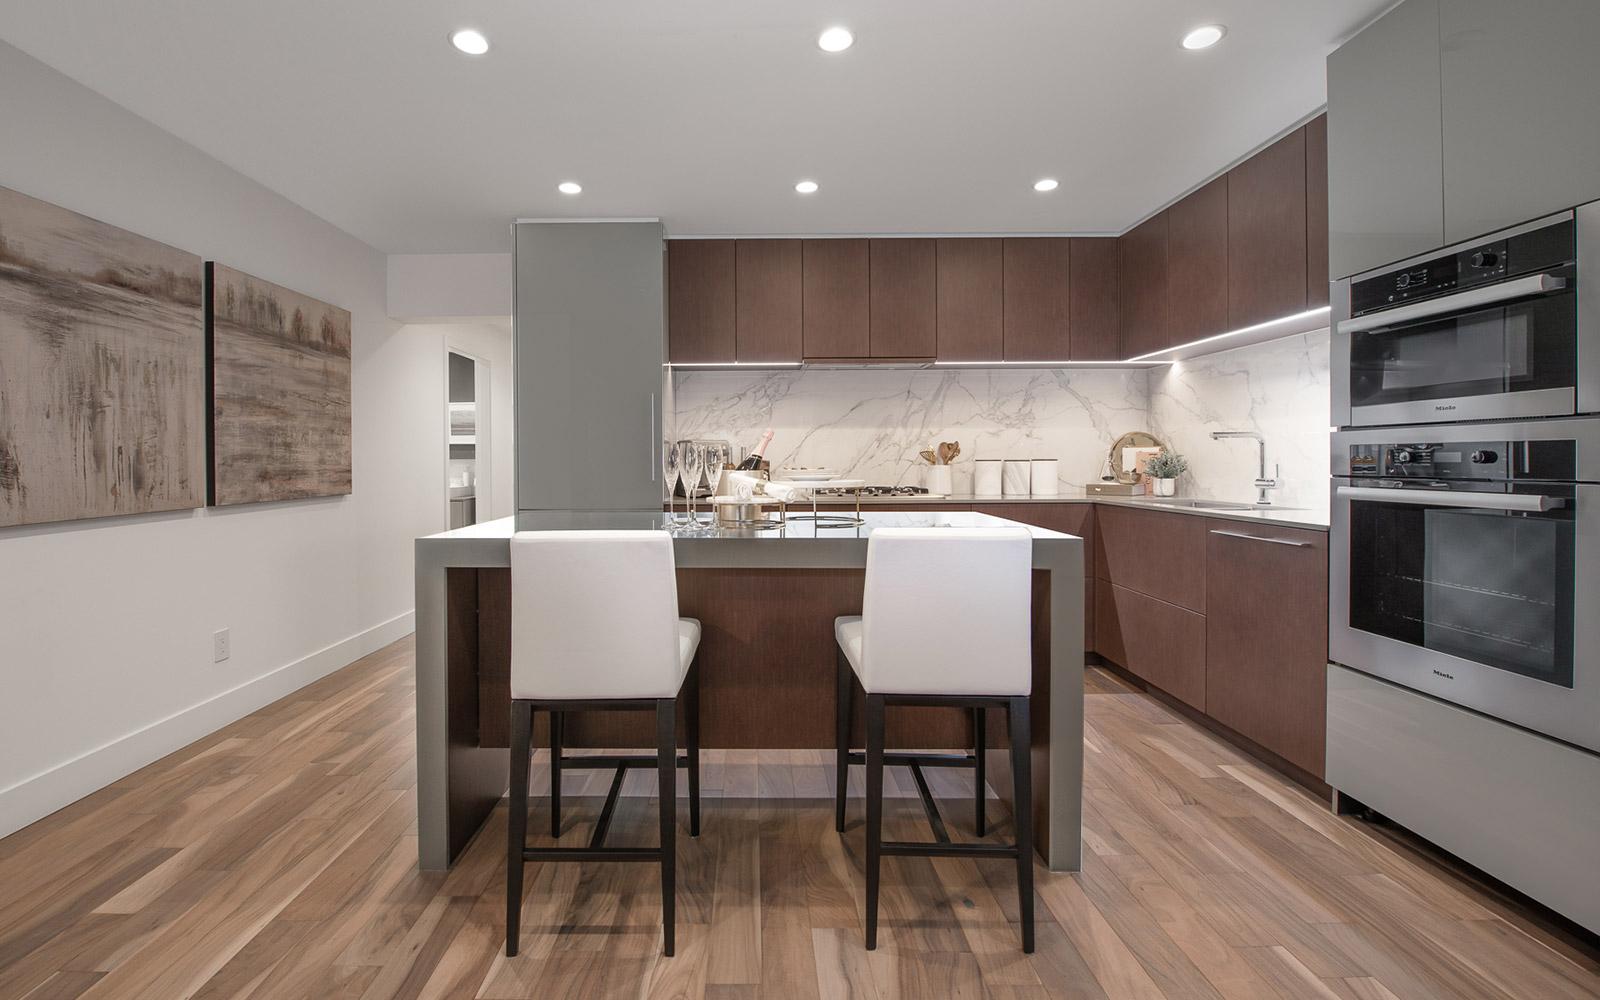 Park West Homes Kitchen